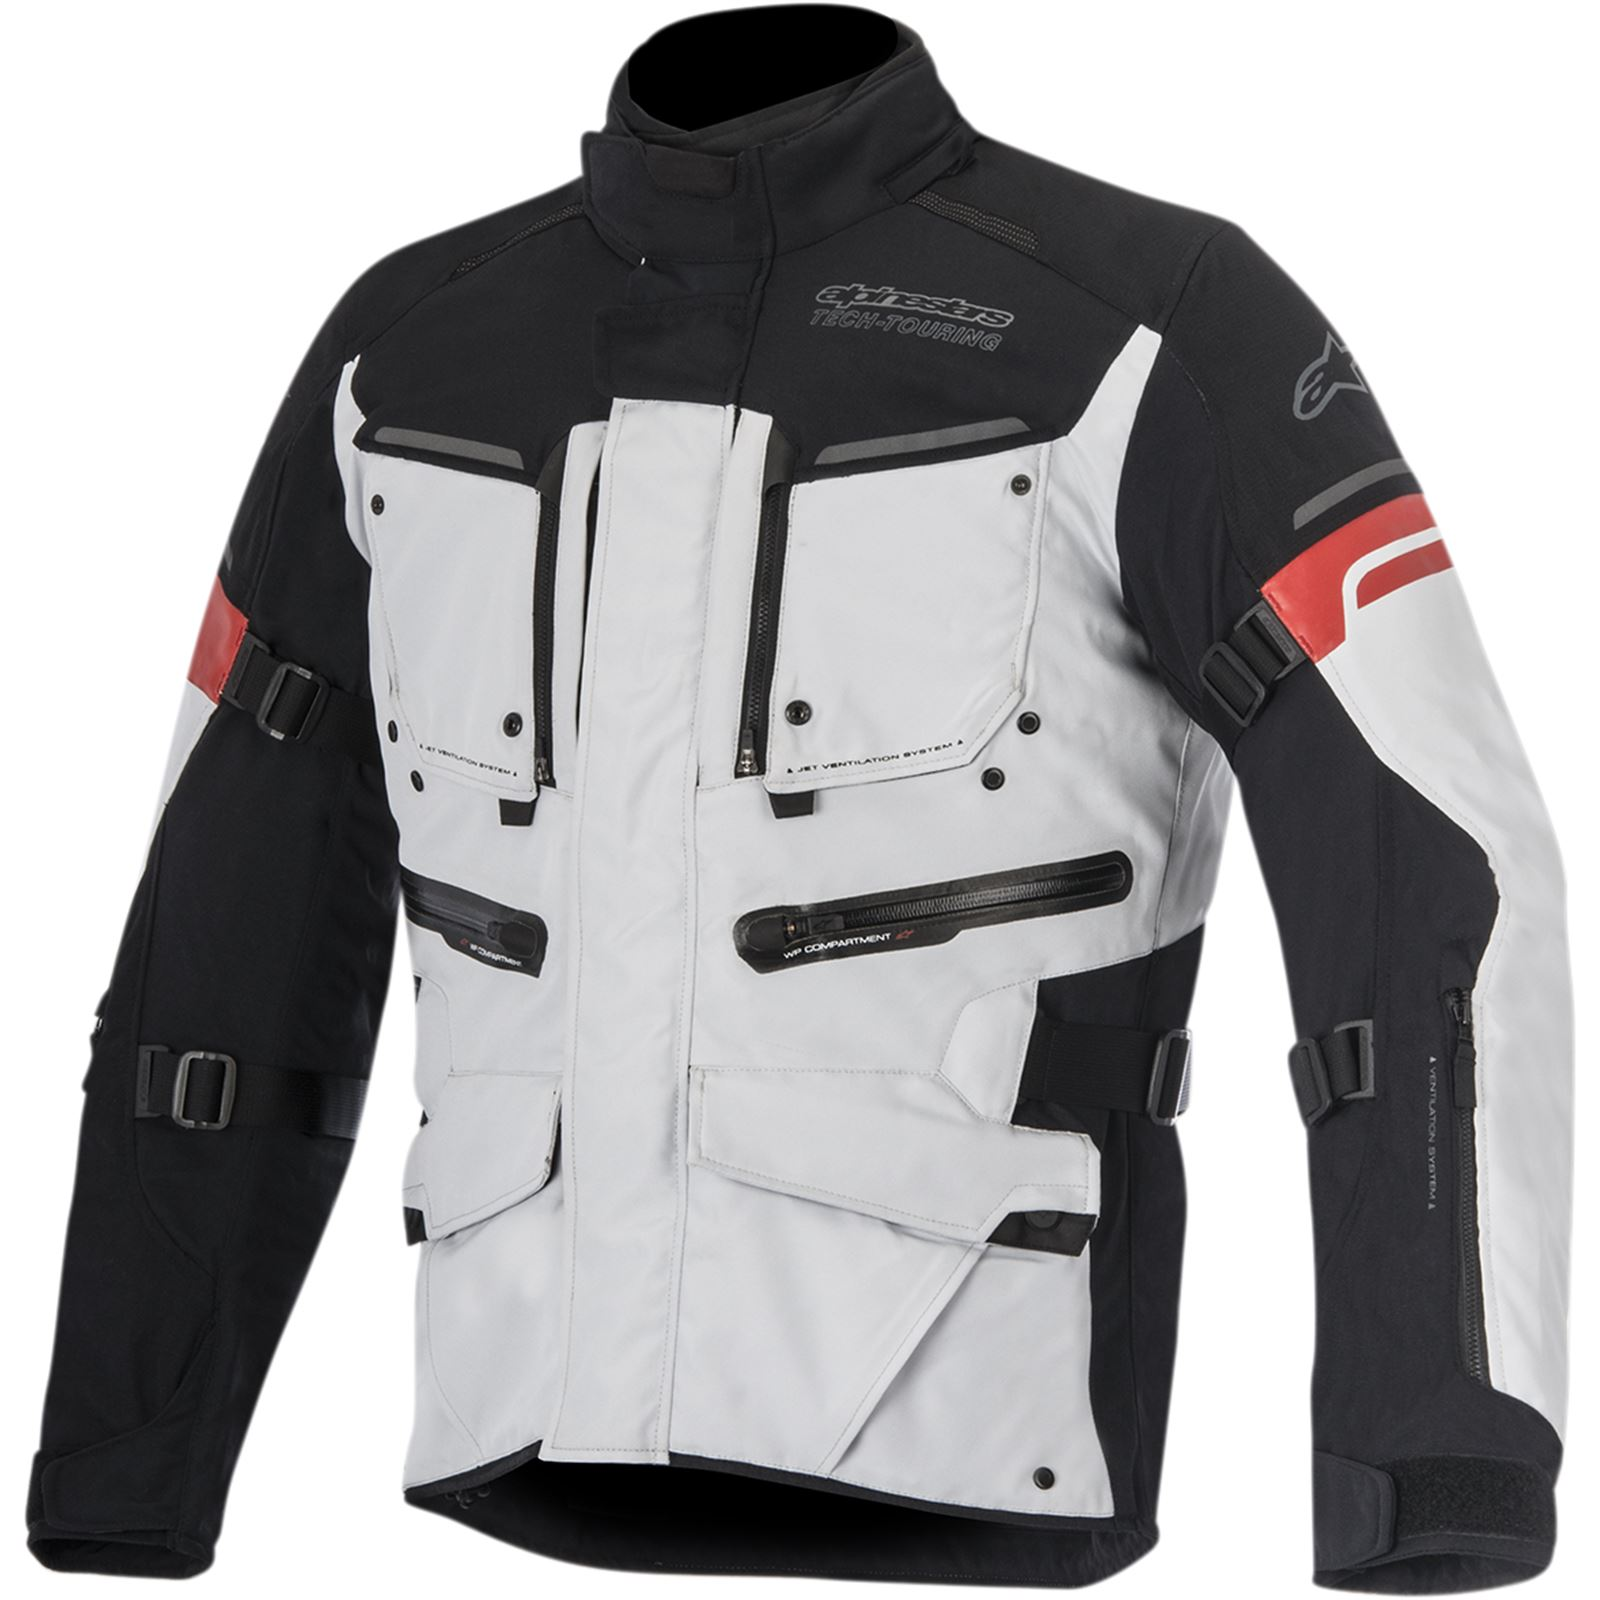 Alpinestars Valparaiso 2 Drystar® Jacket Grey/Black/Red X-Large